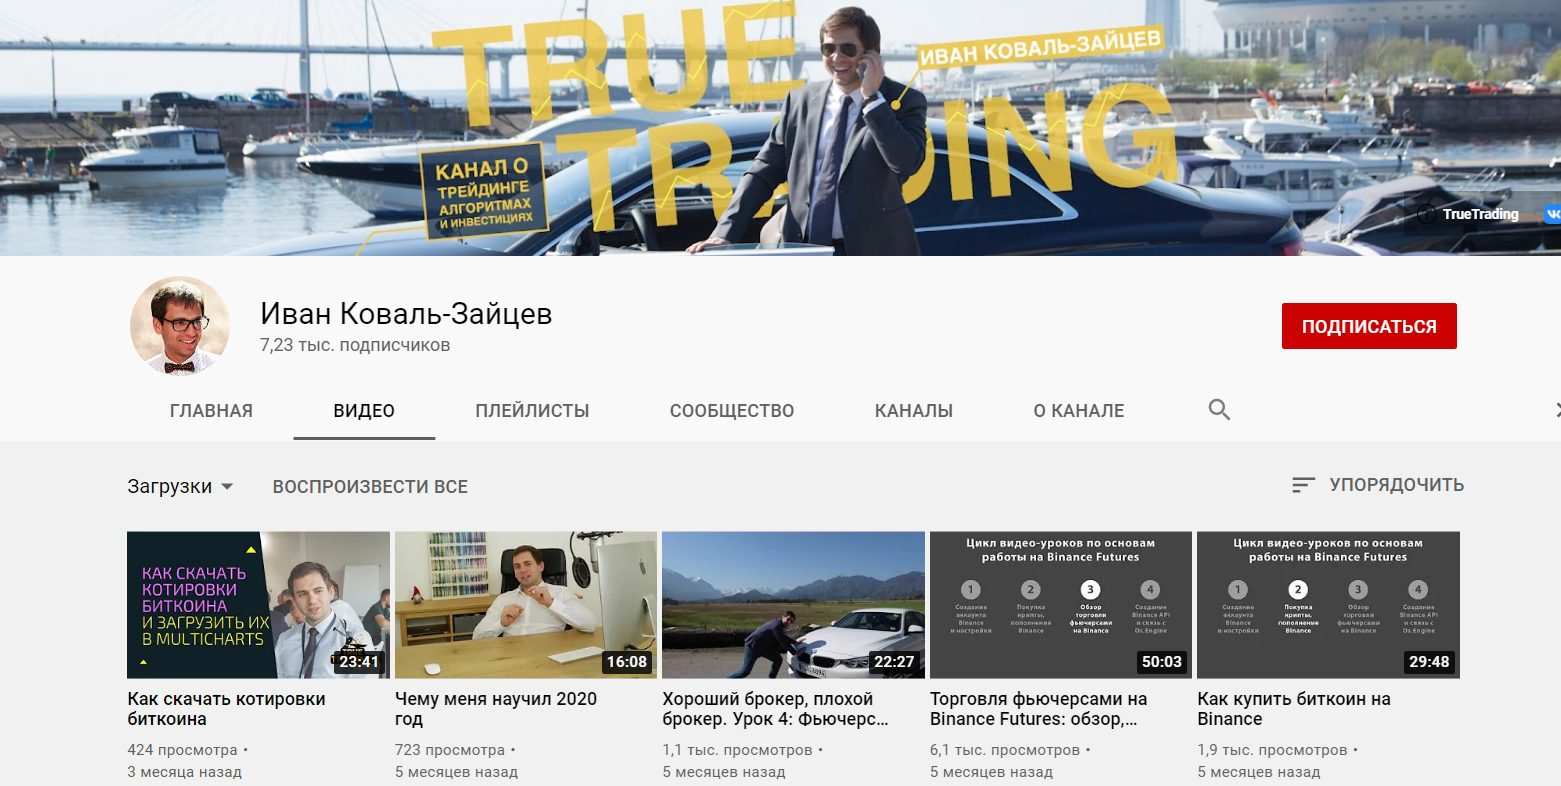 Ютуб канал Ивана Коваль-Зайцева